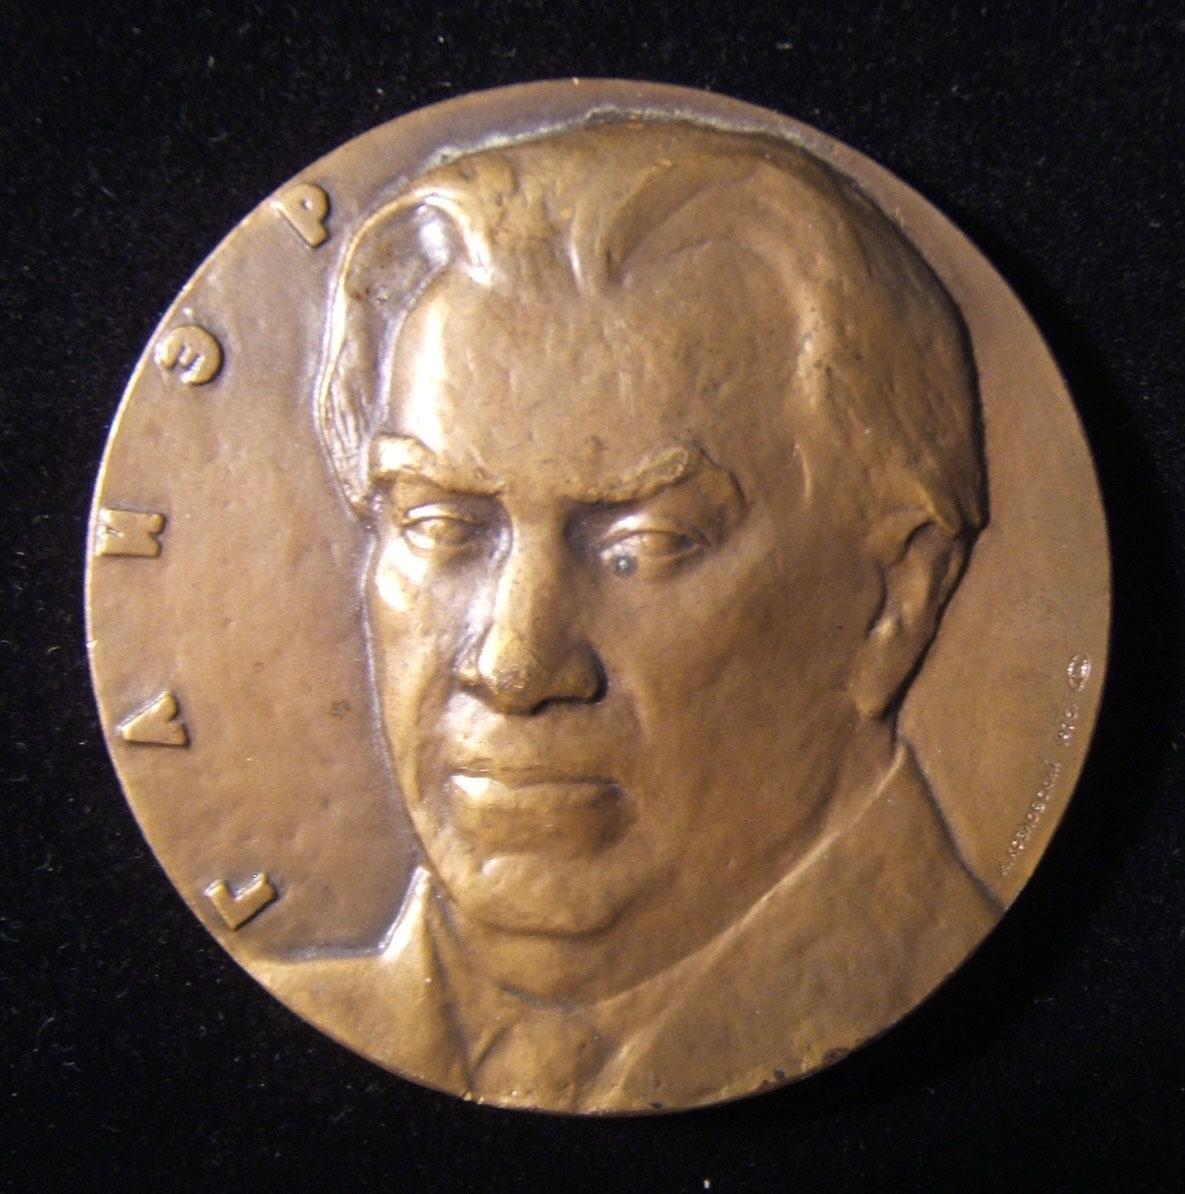 Soviet Russian Reinhold Moritzevich/Ernest Gliere Judaica medal, Kozlovsky 1975